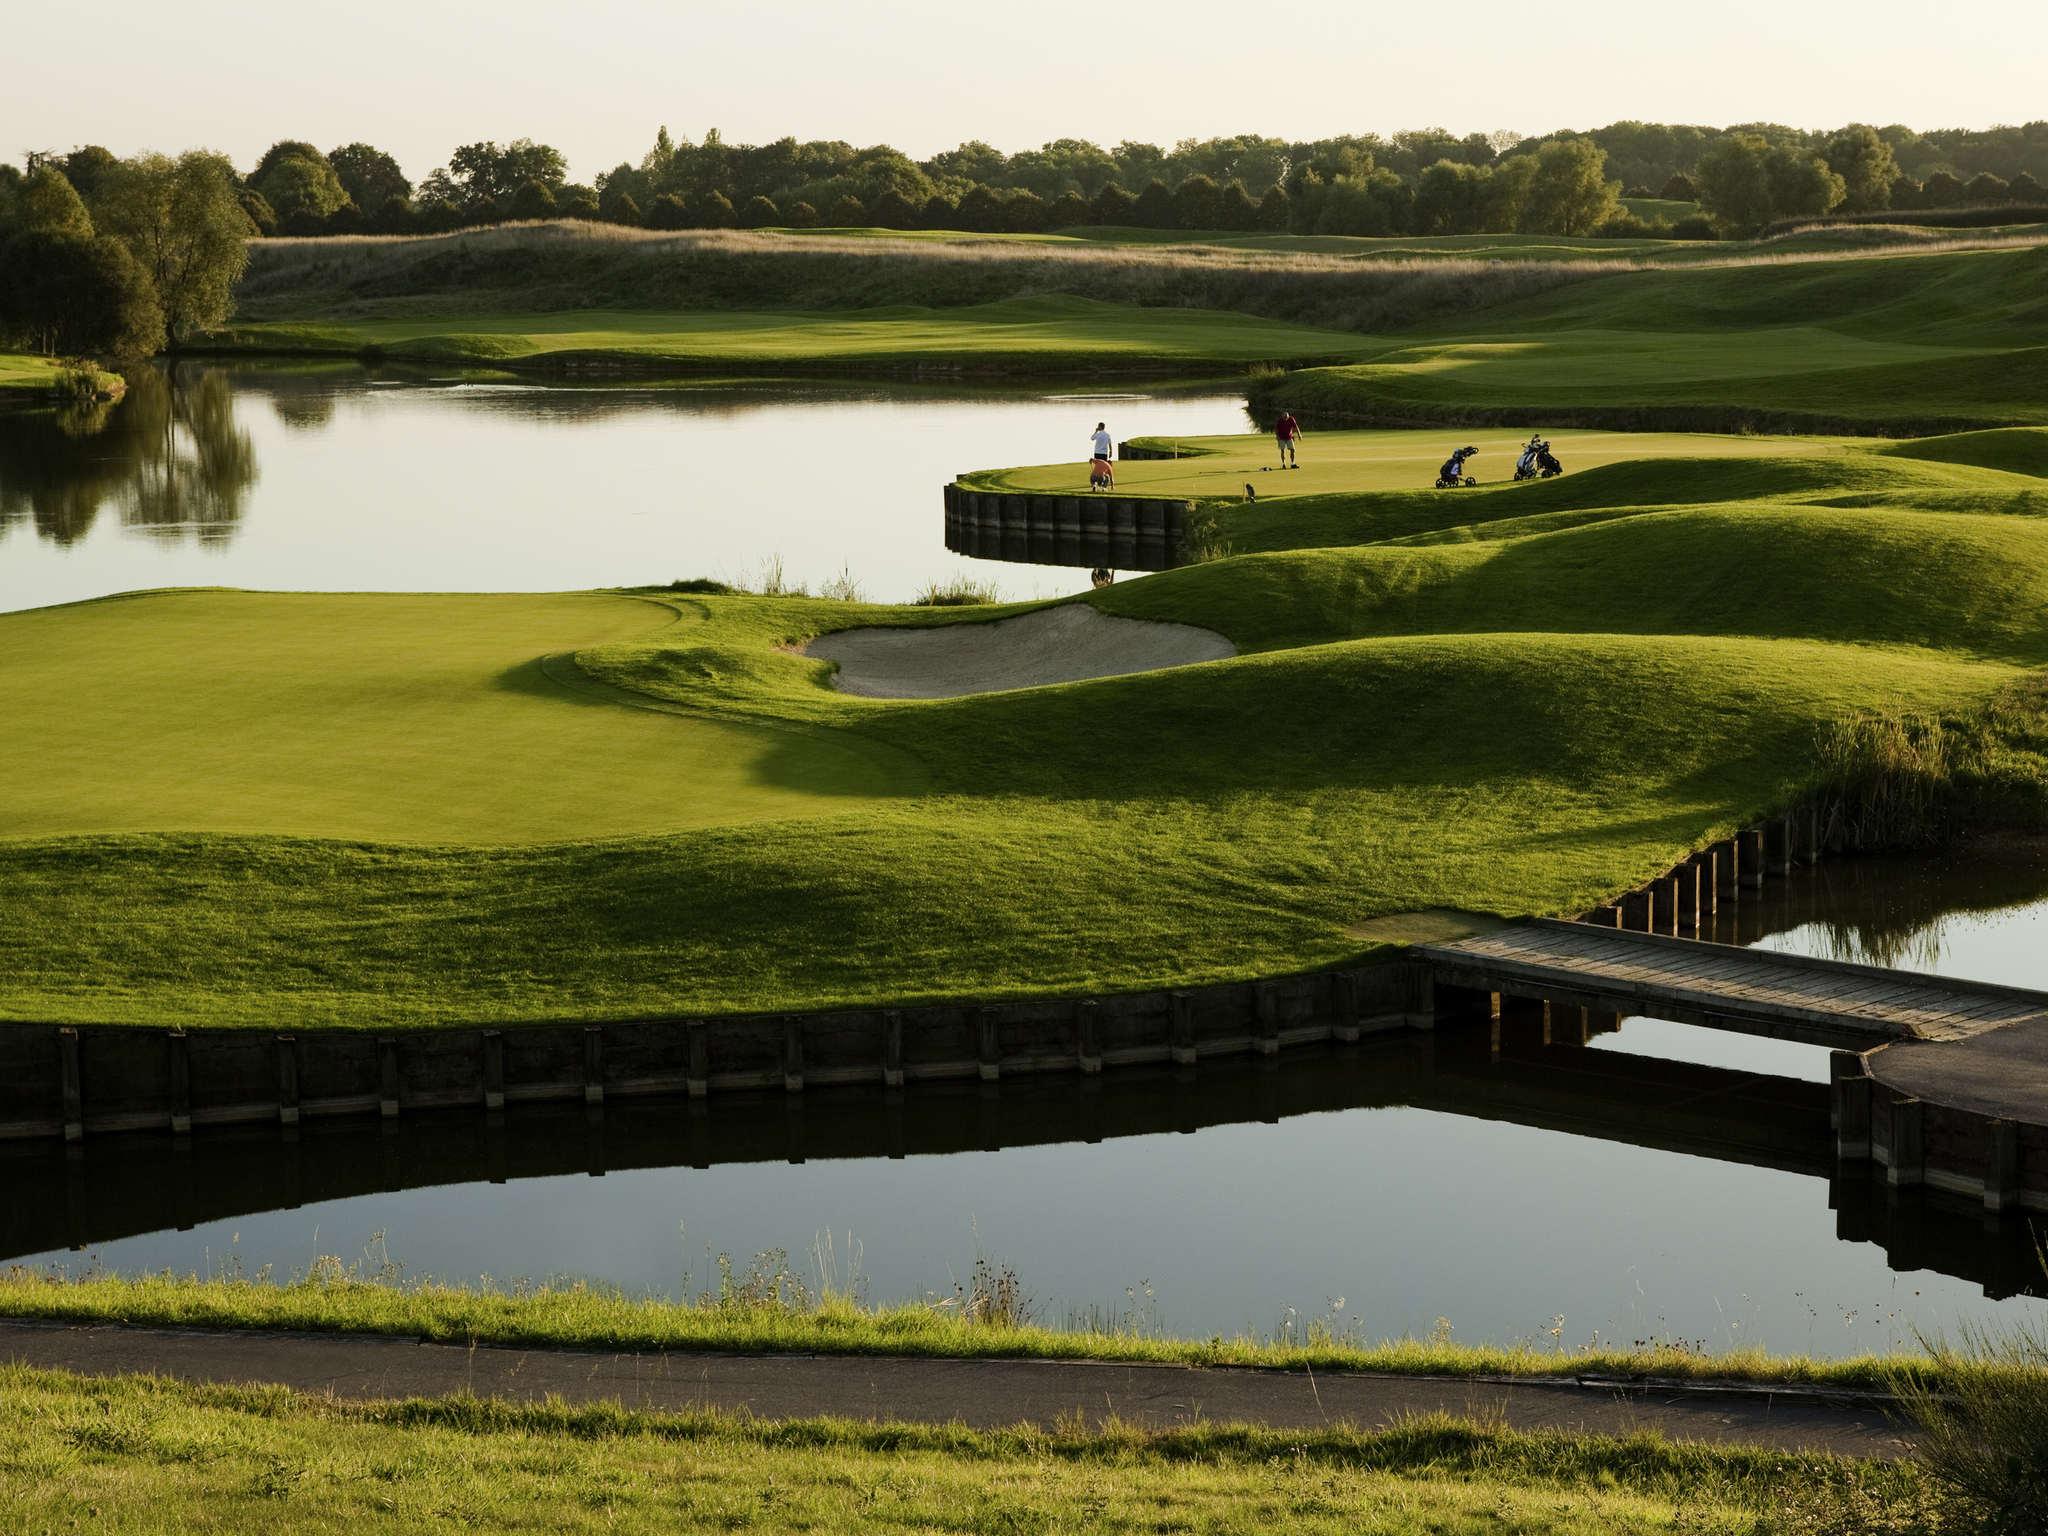 Hotel - Novotel Saint Quentin Golf National